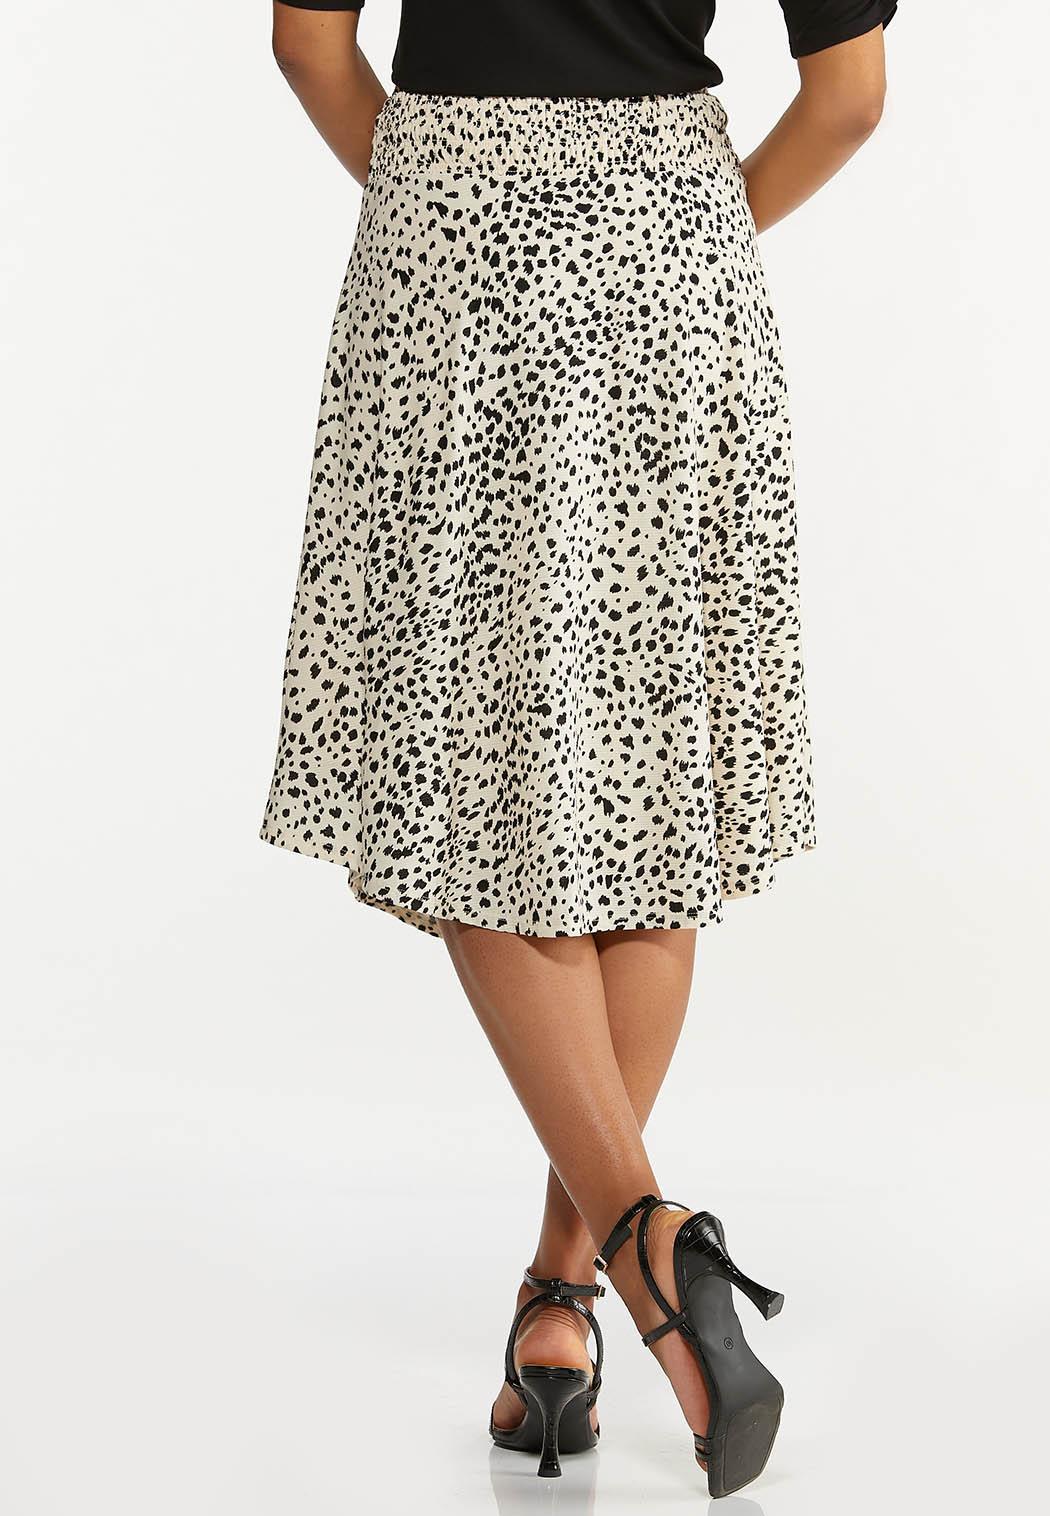 Textured Animal Print Skirt (Item #44618442)